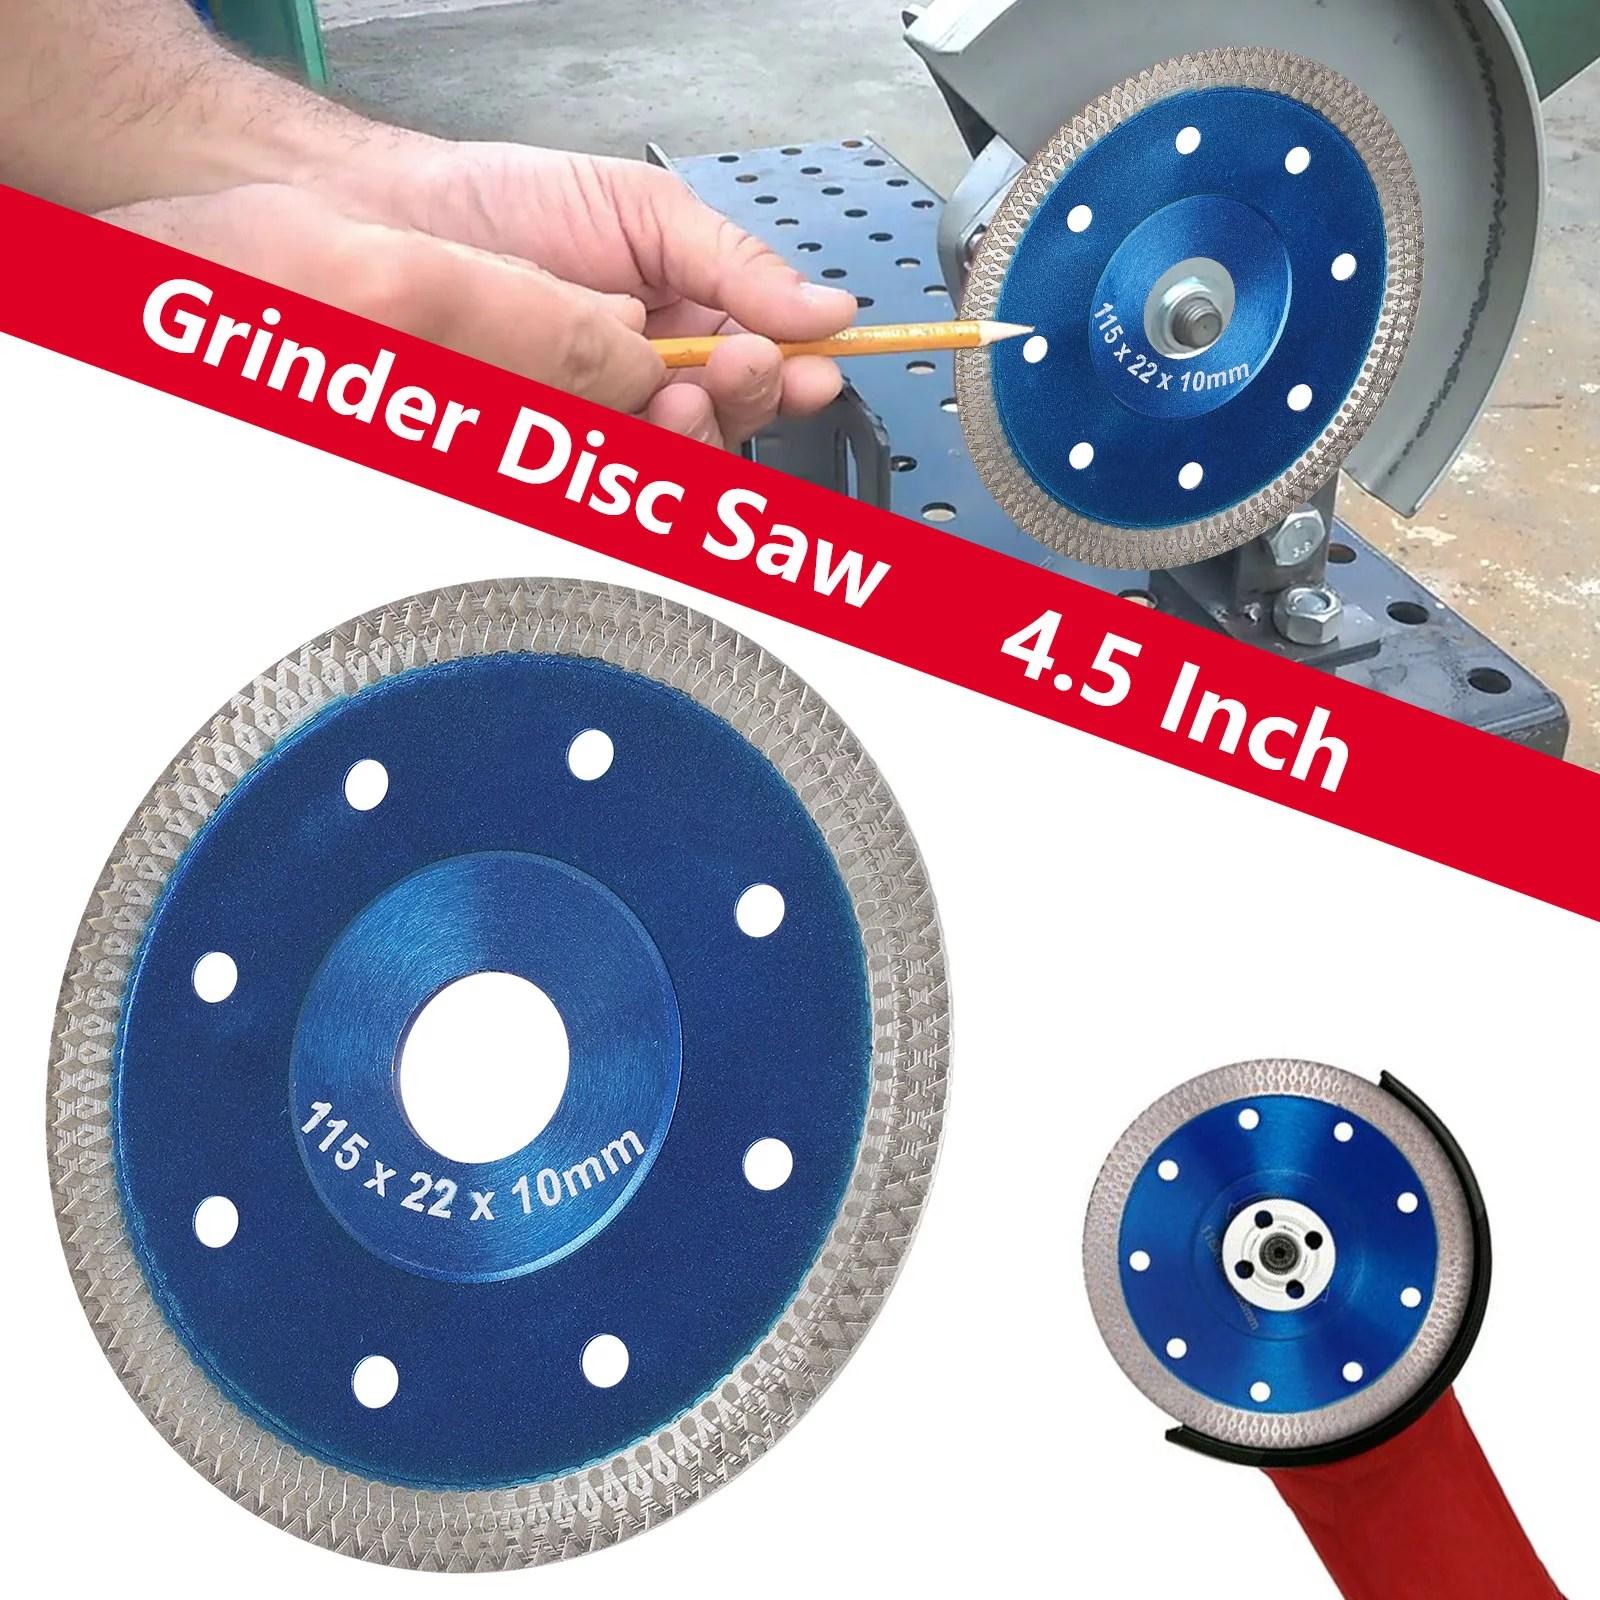 eeekit tile cutter blade 4 5 inch porcelain diamond saw blade ceramic cutting disc wheel for angle grinder grinder dry and wet tile cutter disc